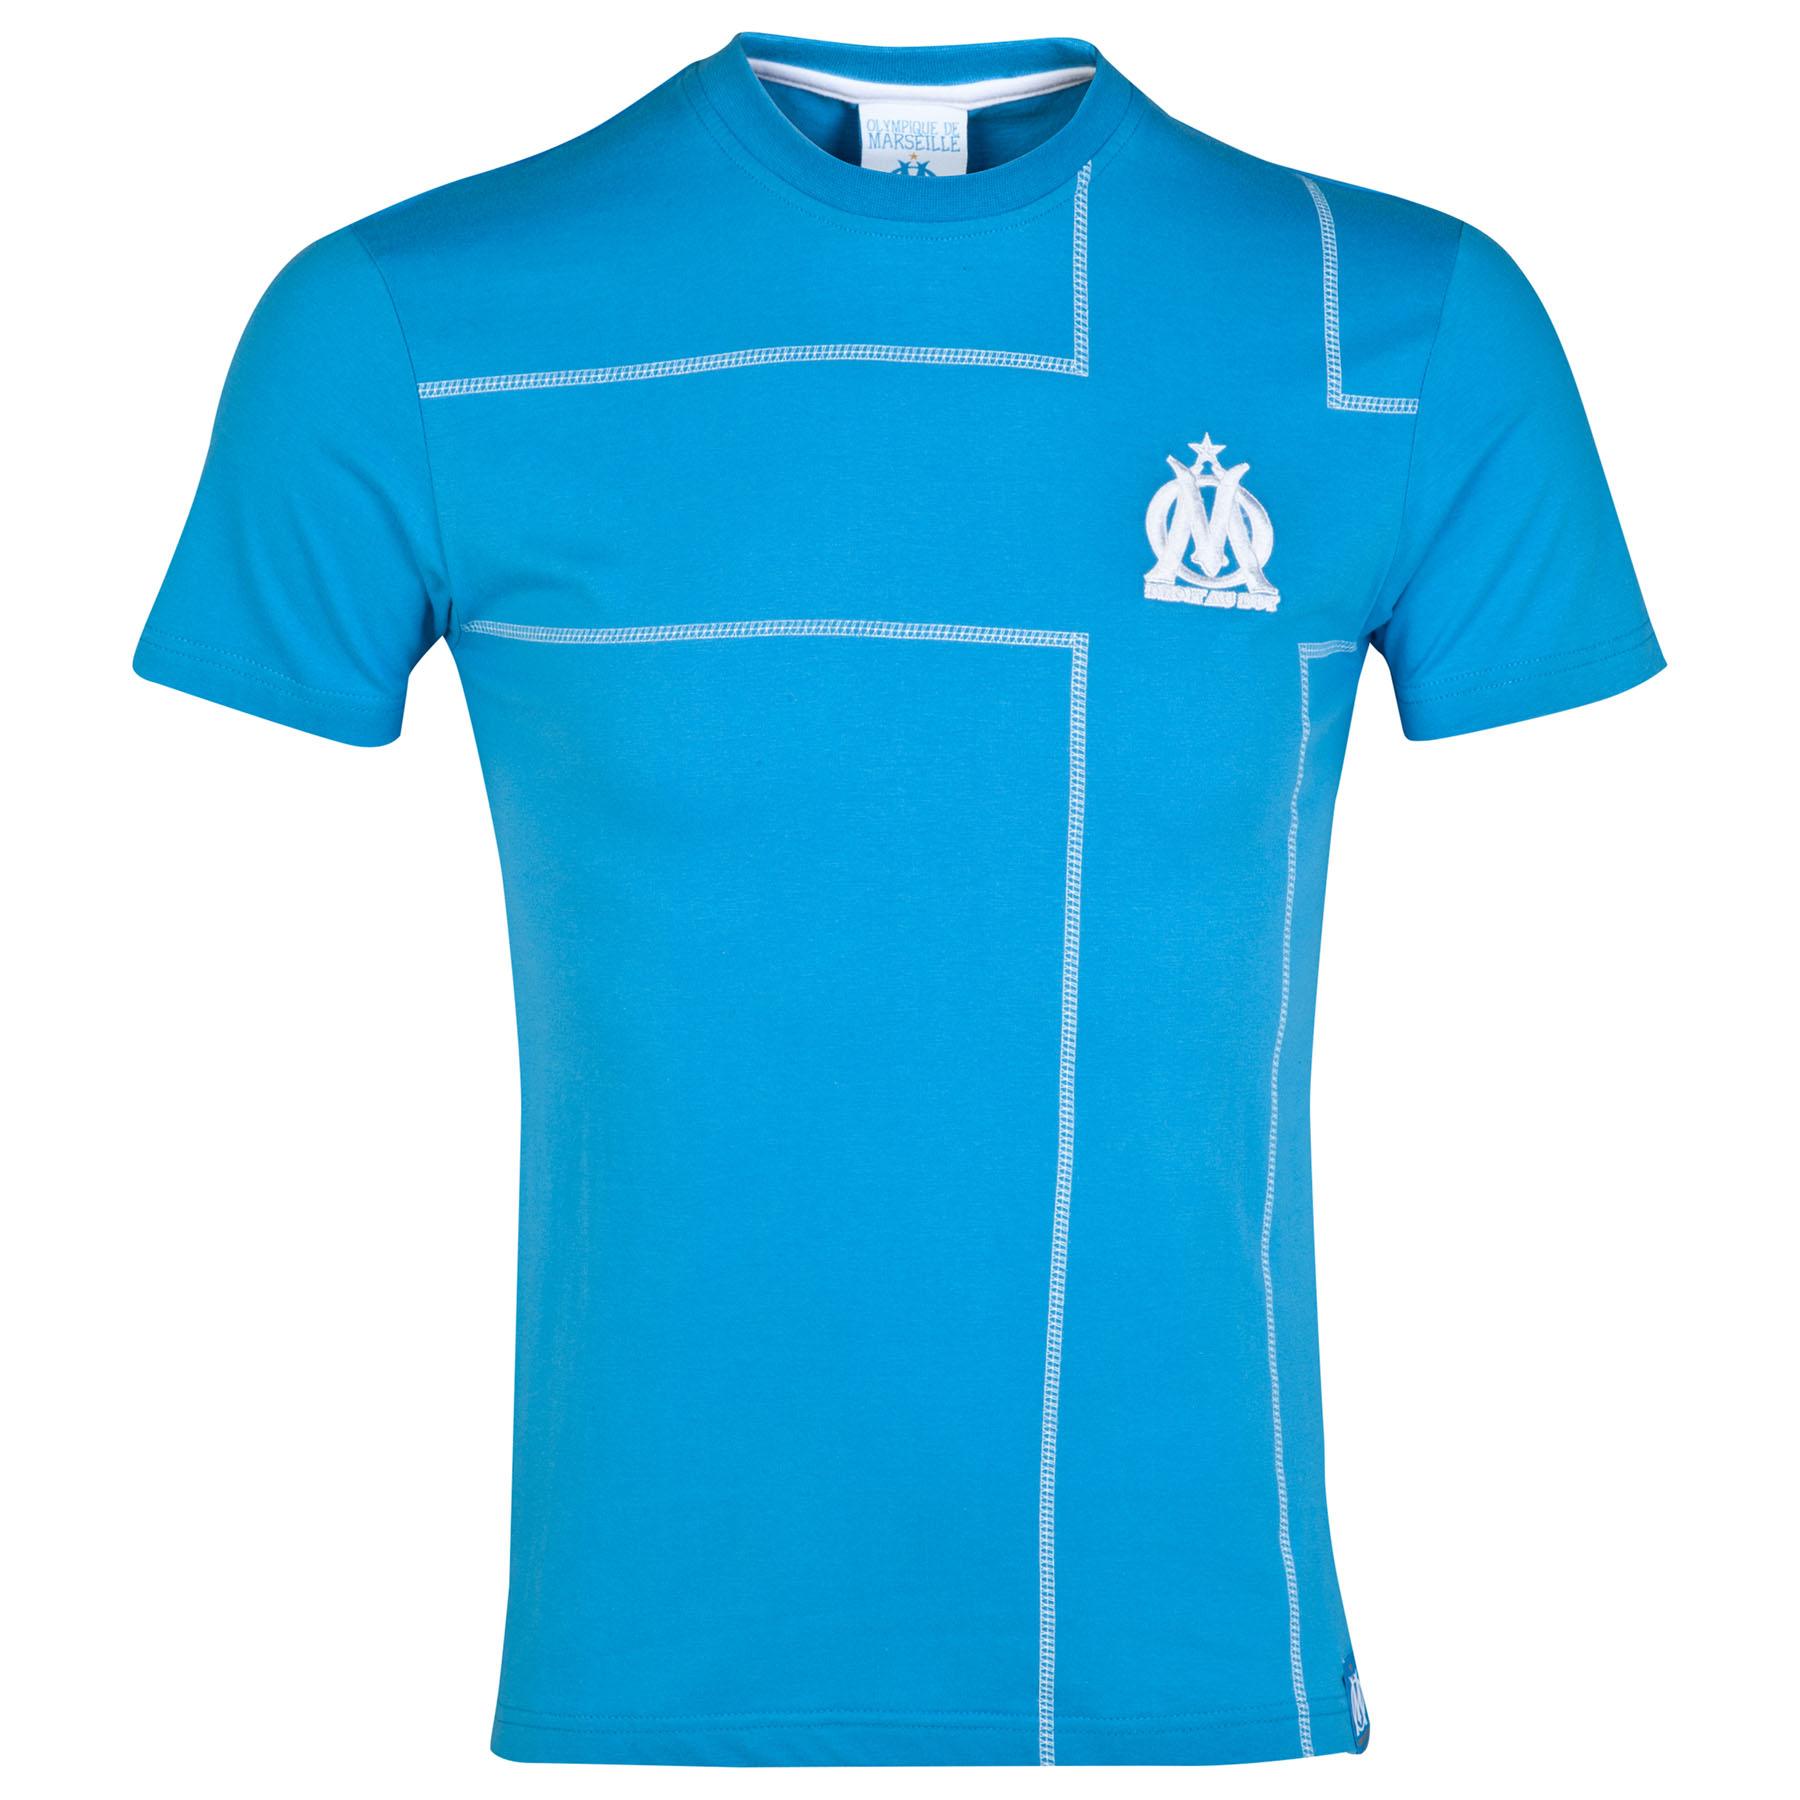 Olympique de Marseille Cross T-Shirt - Blue - Mens